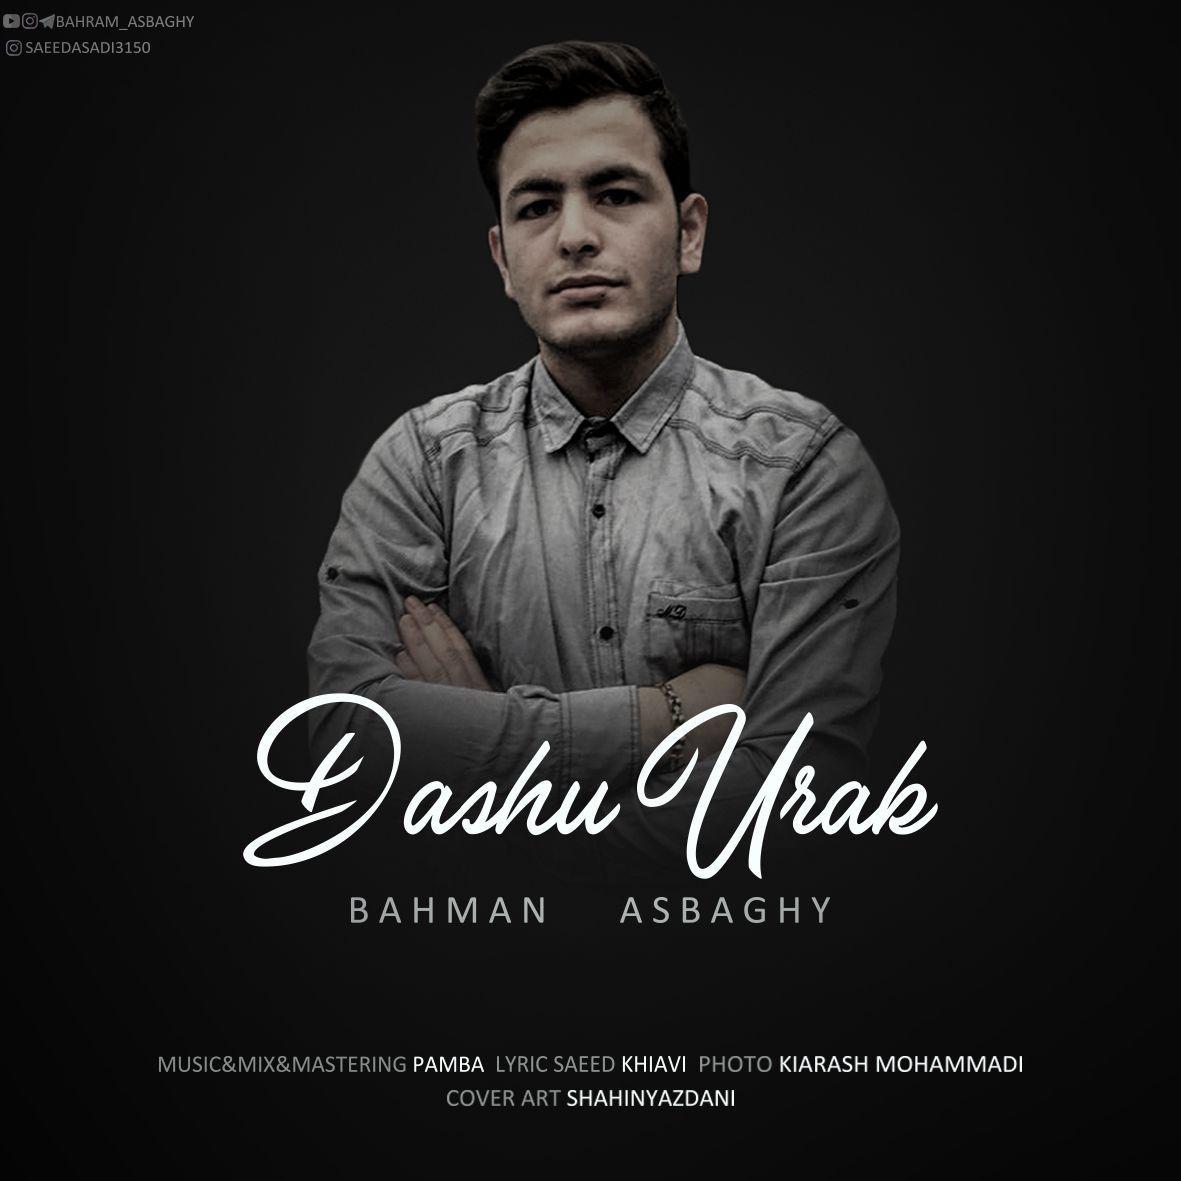 Bahman Asbaghy - Dash Urak